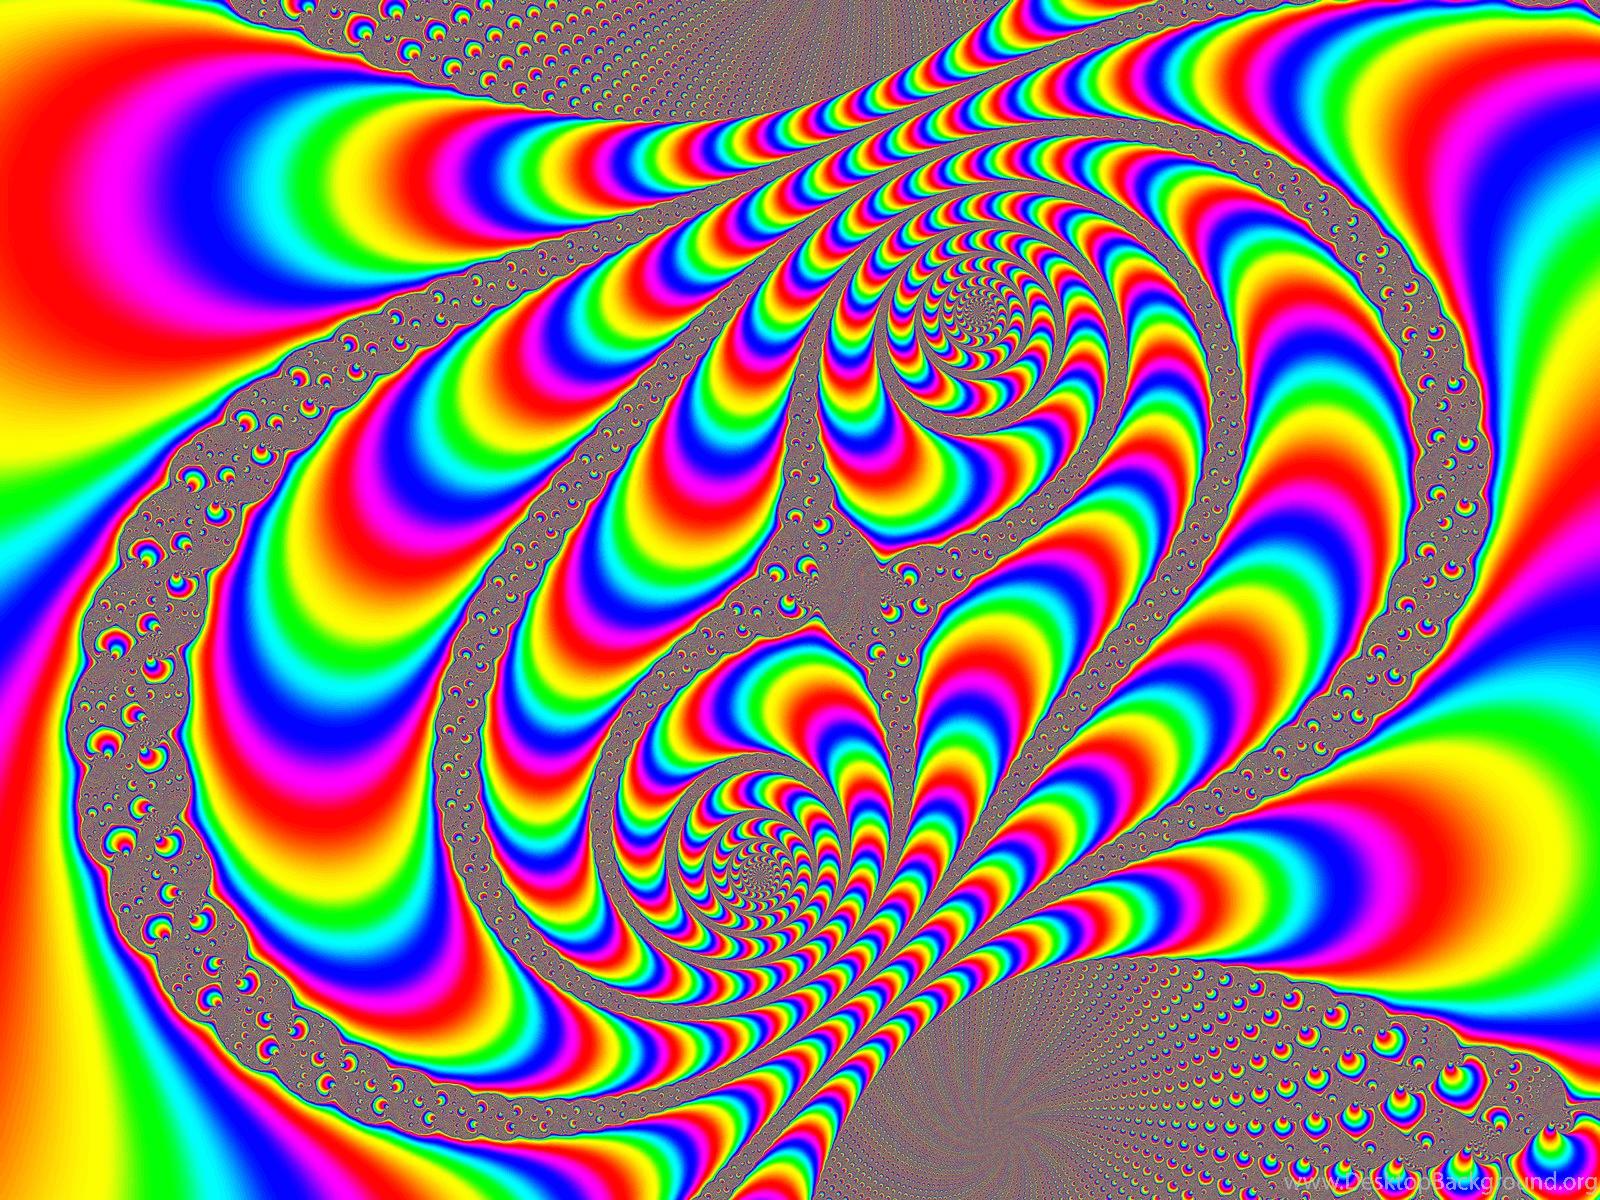 Cool Tie Dye Wallpapers - Top Free Cool Tie Dye ...